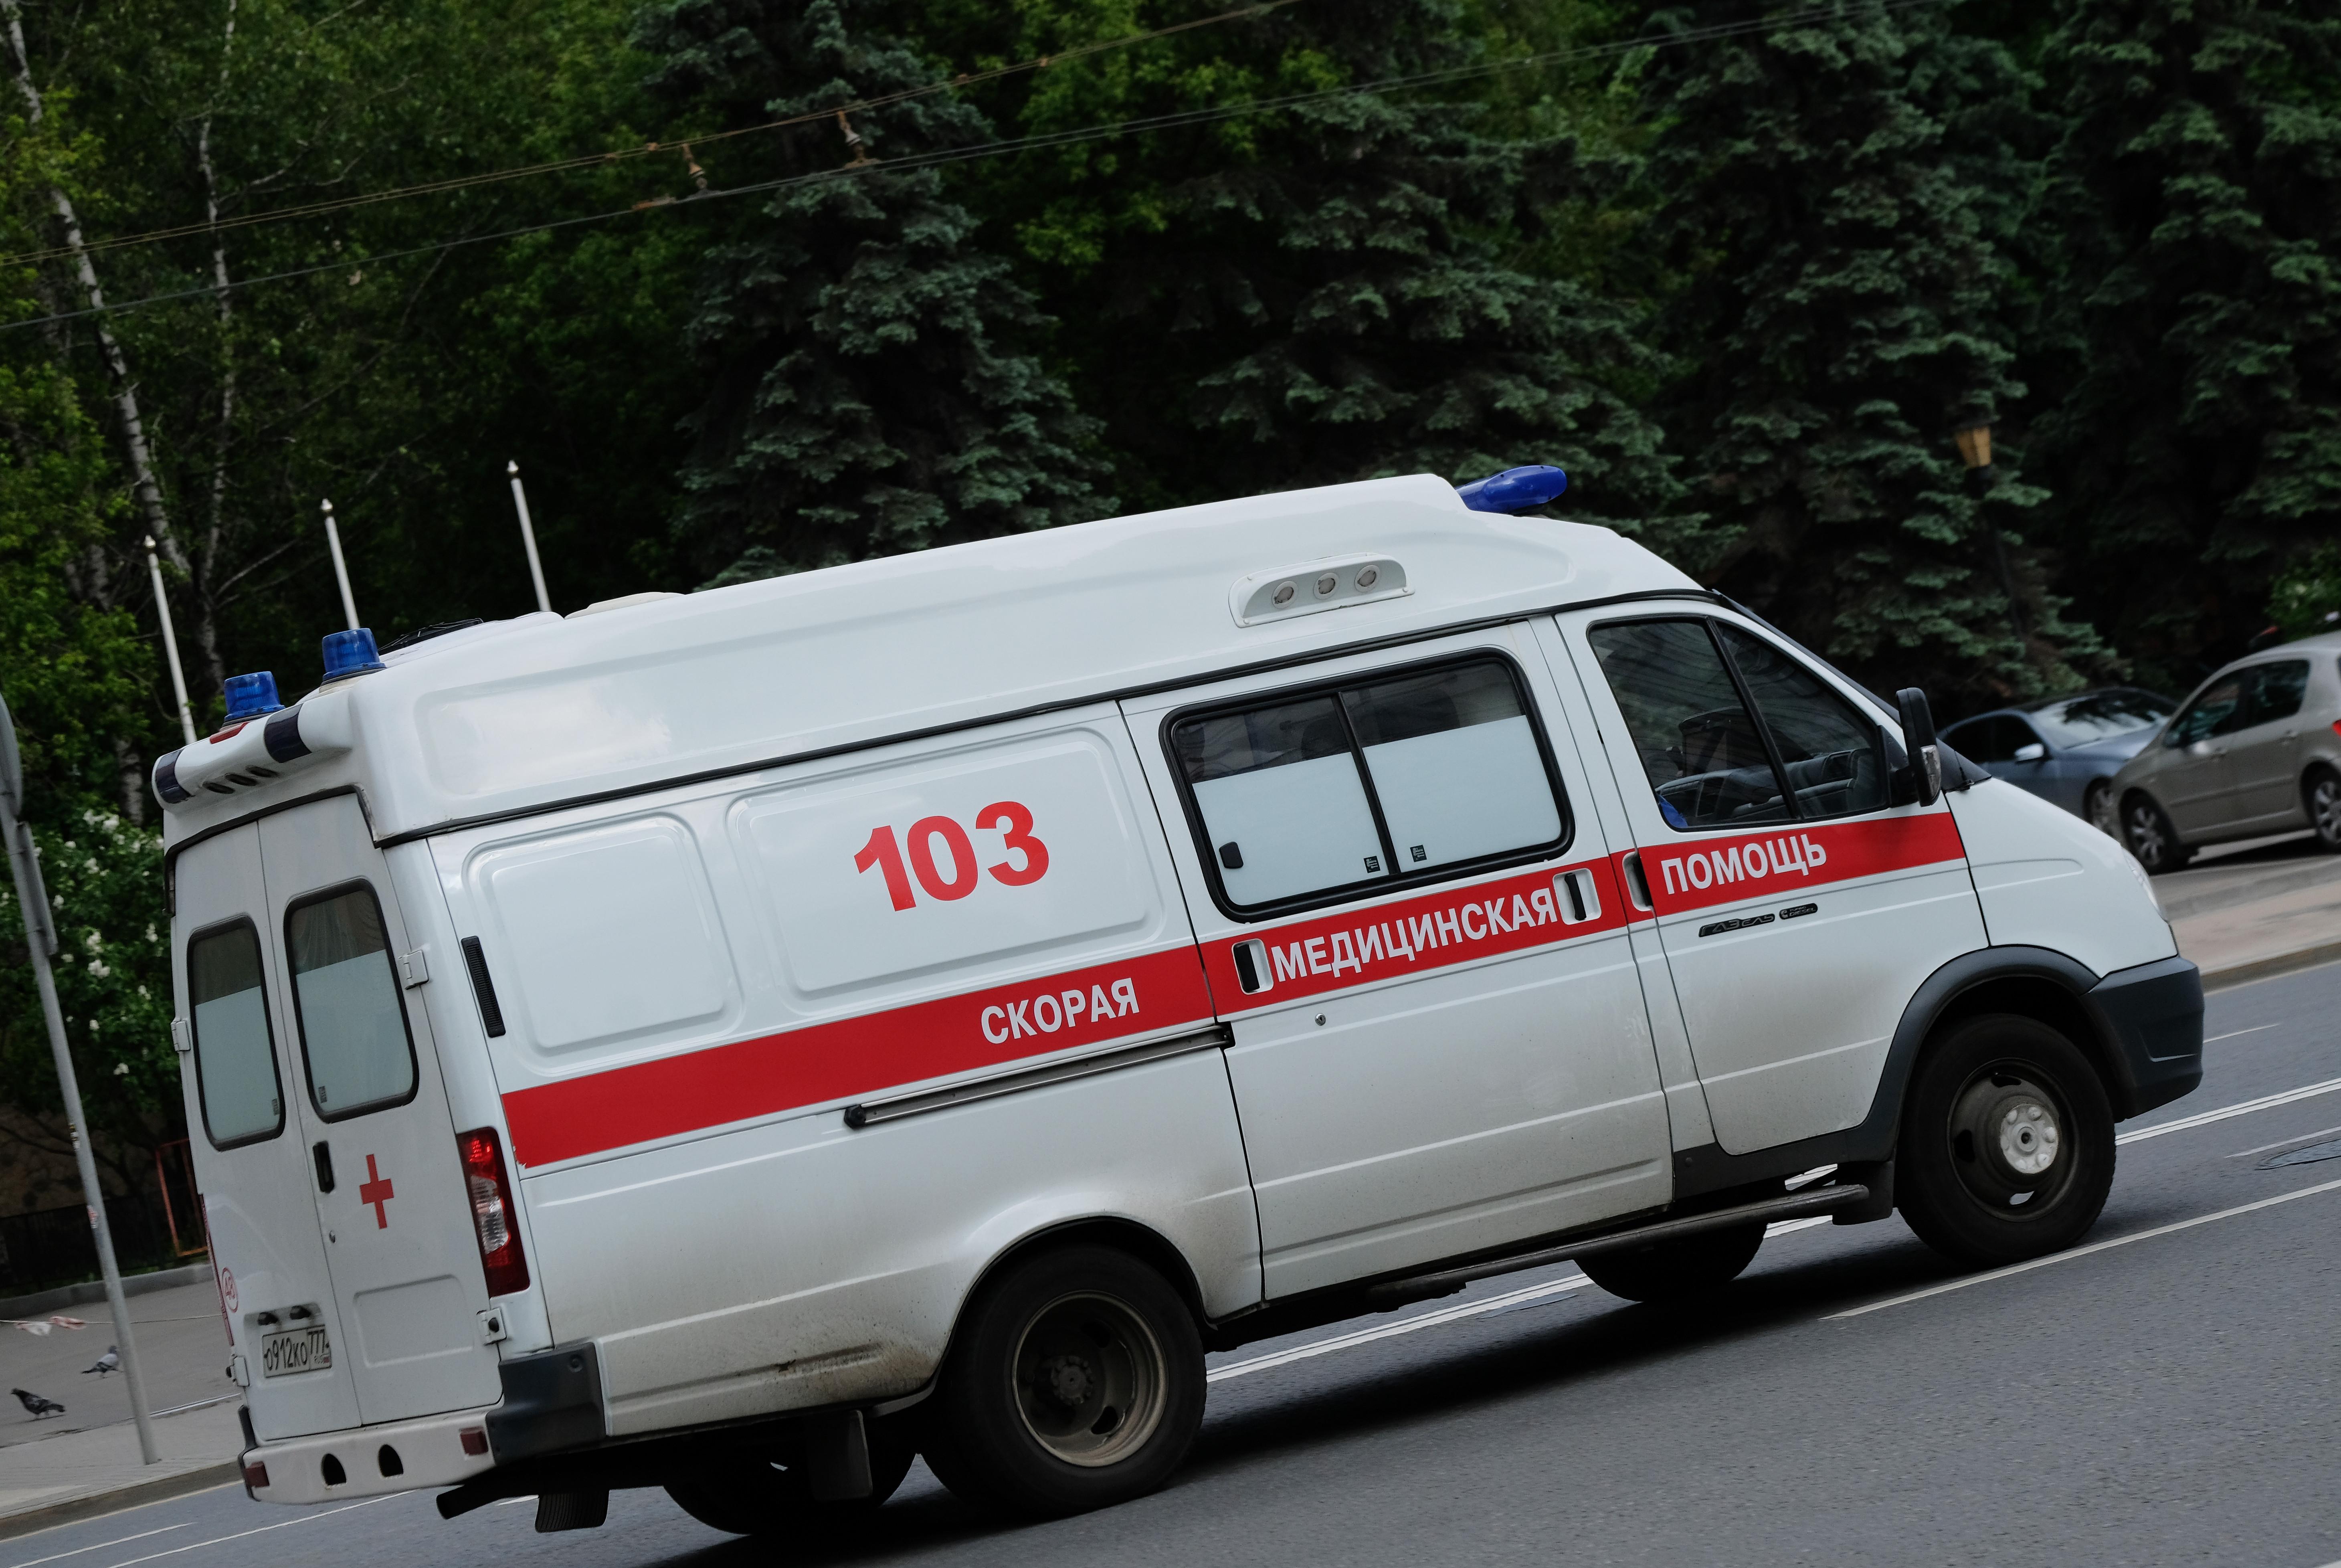 <p>Фото: &copy;РИА Новости/Наталья Селиверстова</p>